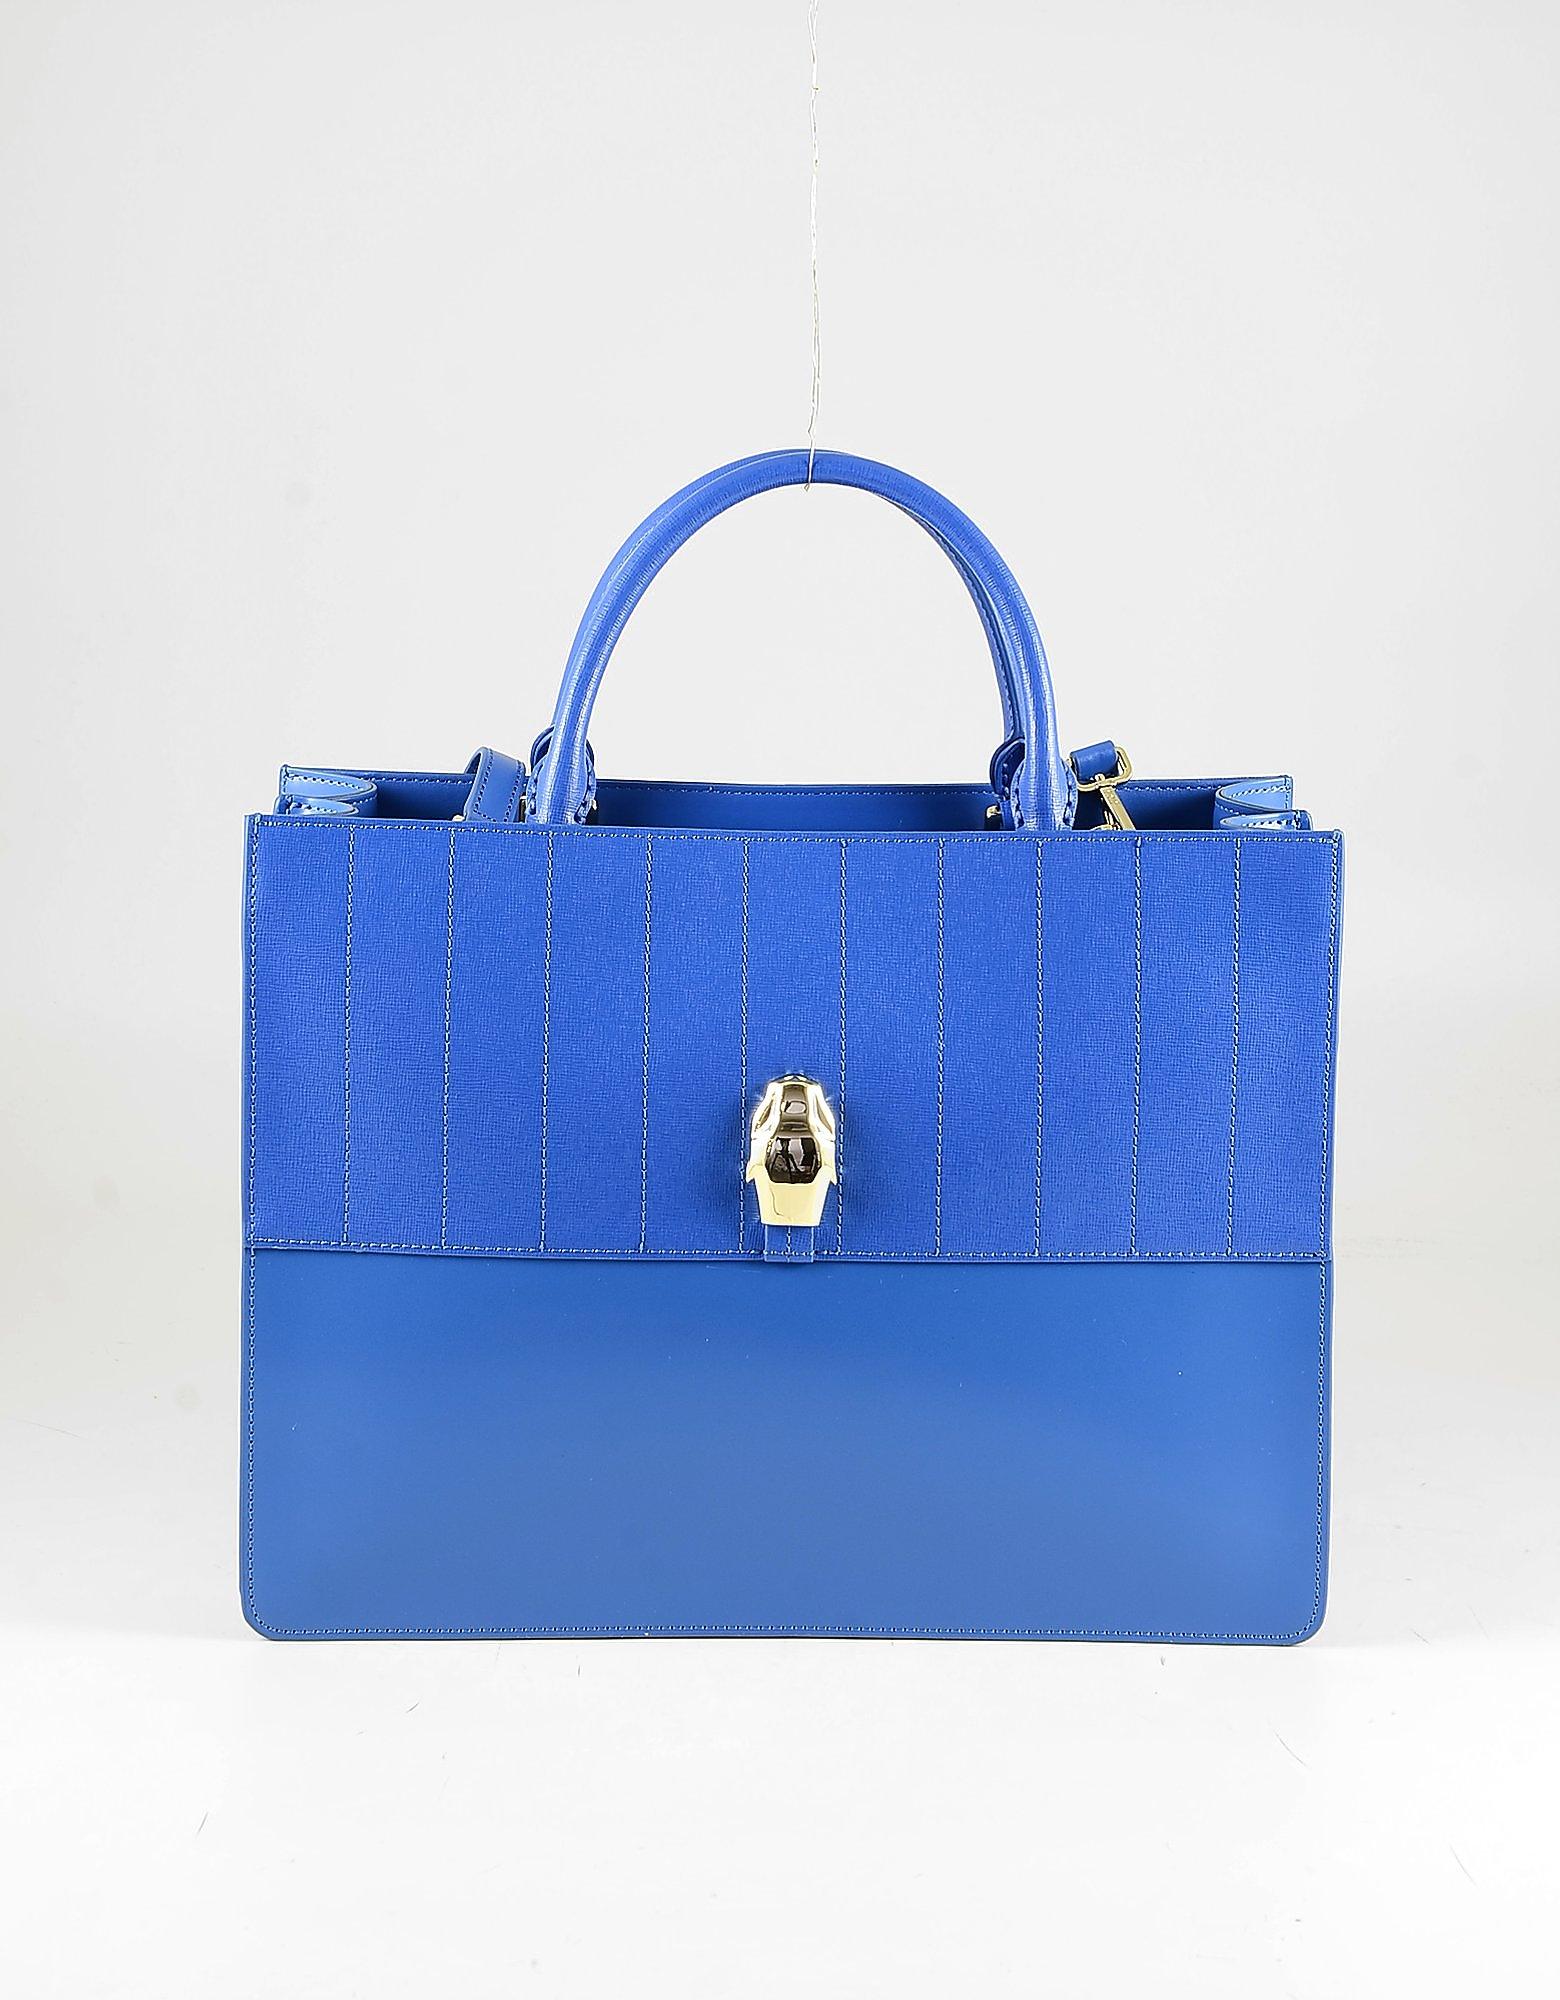 Class Roberto Cavalli Bright Blue Leather Tote Bag